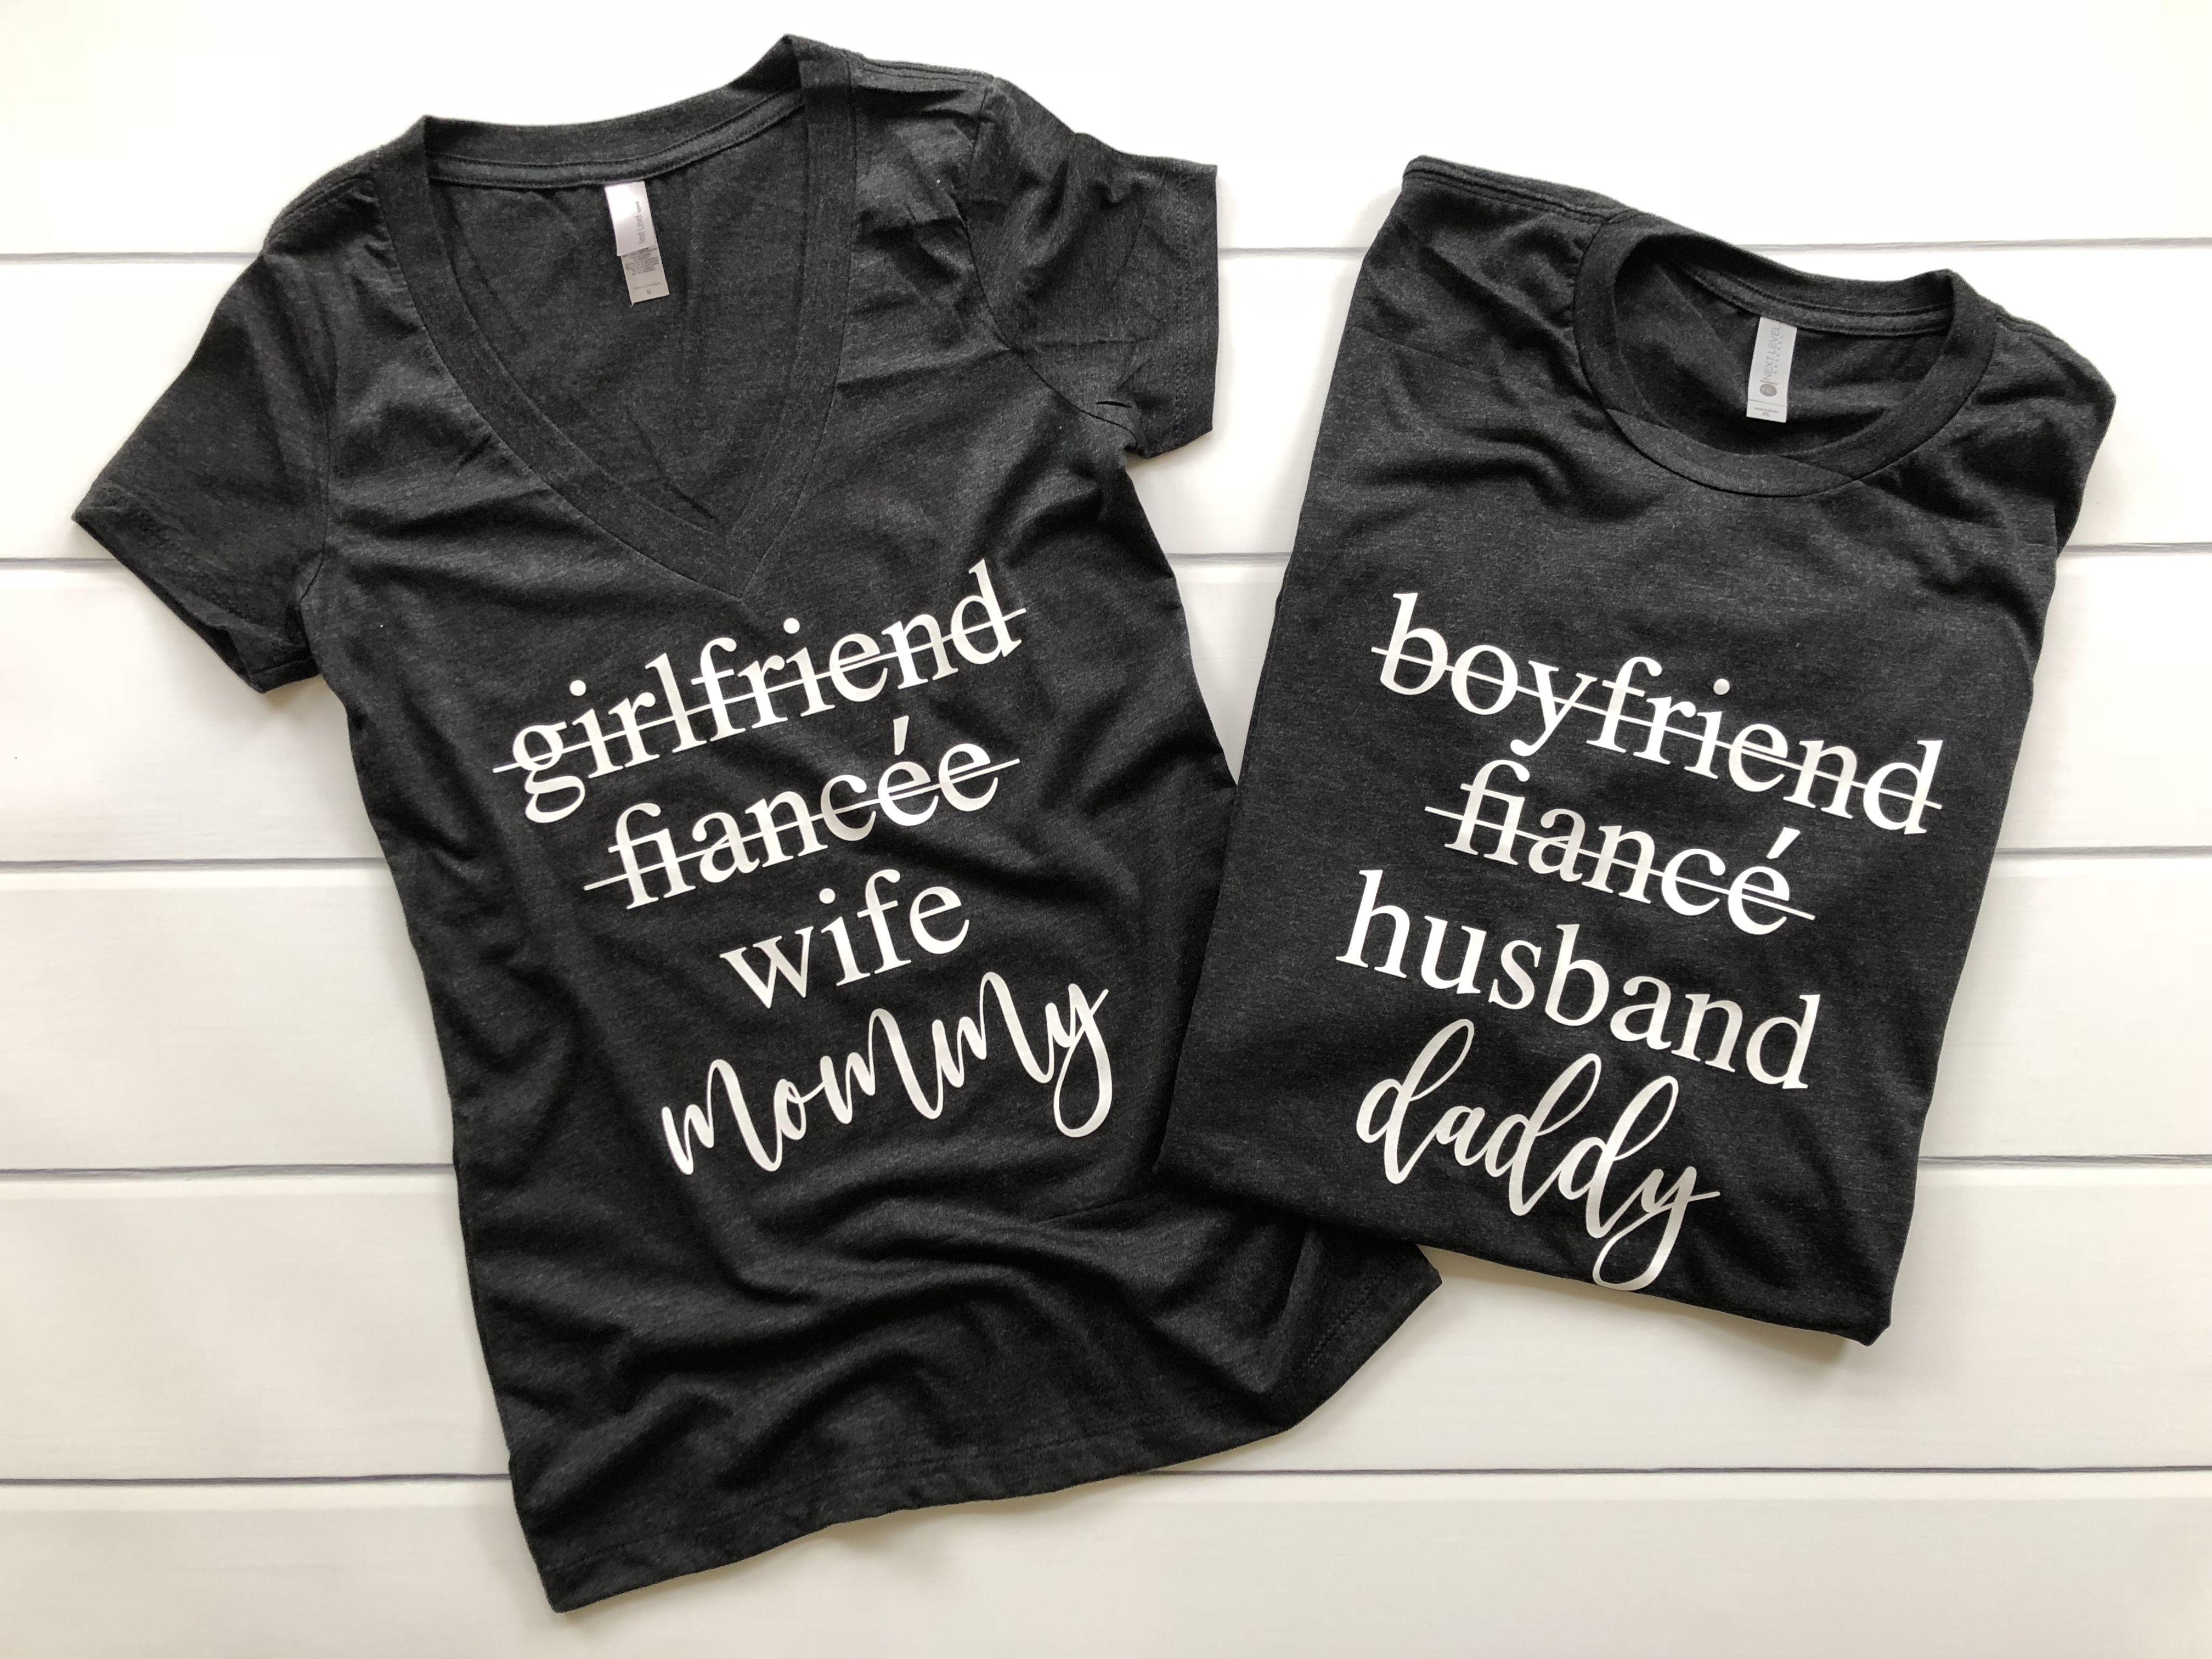 e89789e6 Girlfriend/Boyfriend to Mommy/Daddy | Pregnancy Announcement Duo, pregnancy  announcement shirts, couples pregnancy announcement shirt, cute ways to  announce ...